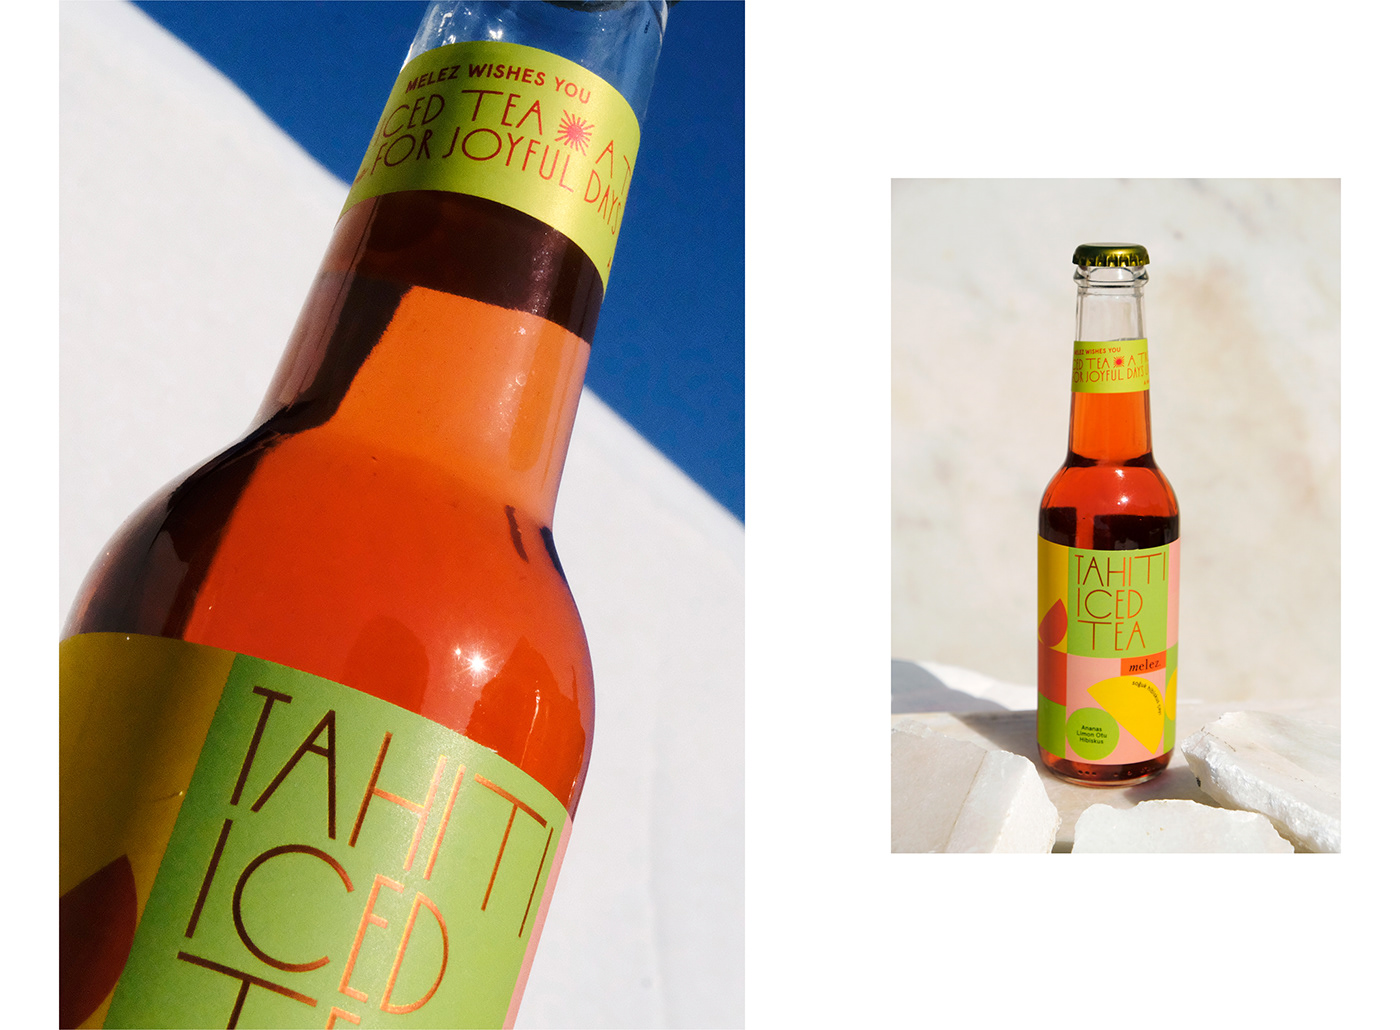 bauhaus design Geometric packaging Geometric Shapes ice tea design Ice Tea packaging label design melez branding melez tea branding multicolor new bauhaus